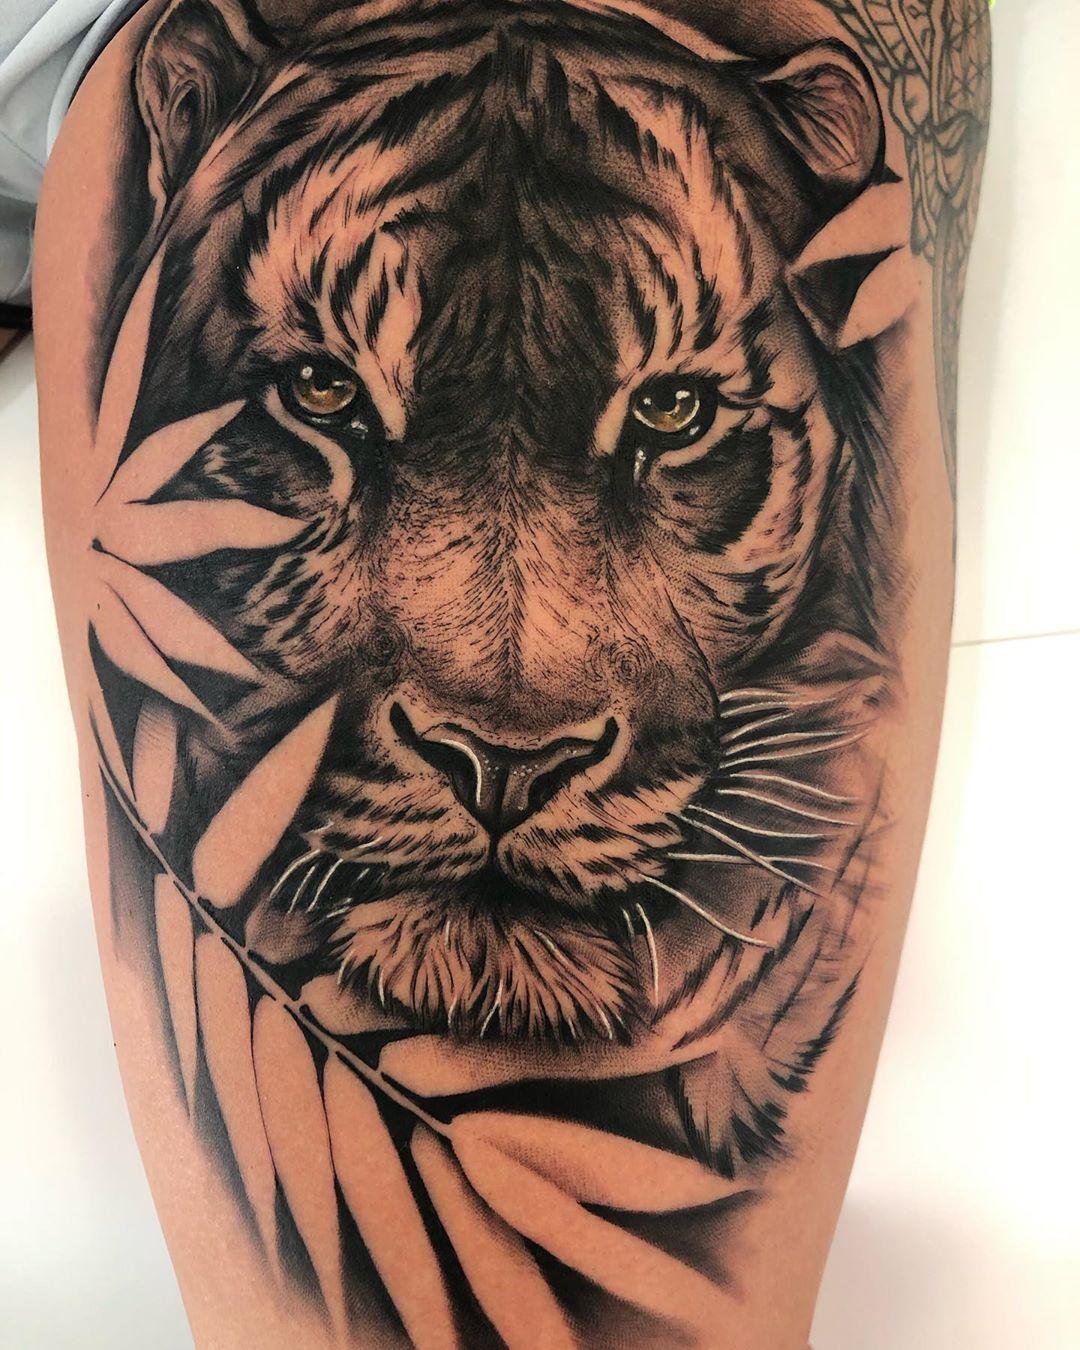 followforfollow,berlin,followmeciudadreal,ciudadreal,tomelloso,almagro,puertollano,tatuajesenpuertollano,tatuajesendaimiel,ciudadrealtattoo,ciudadrealtatuajes,tatuajesciudadreal,follow,ciudadrealtatuajes,puertollano,tattooers,besttattooers,juantabasco,ciudadrealsetatua,ink,tatuajes,realiismo,realistictattoo,ciudadrealtattoo,tatuajesenpuertollano,traditionaltattoos,castillalamancha,ink,tattooart,zurichtattoo,daimiel